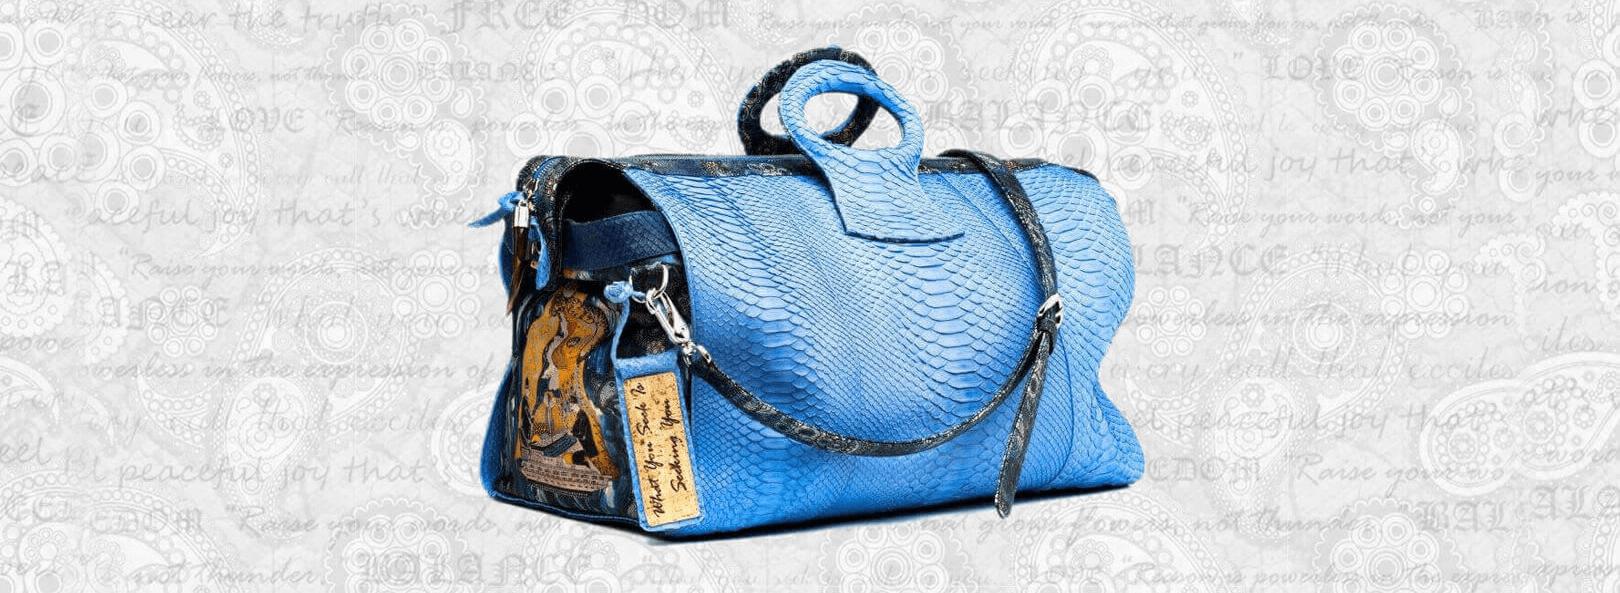 duffel-ganesh-python hand bag blue